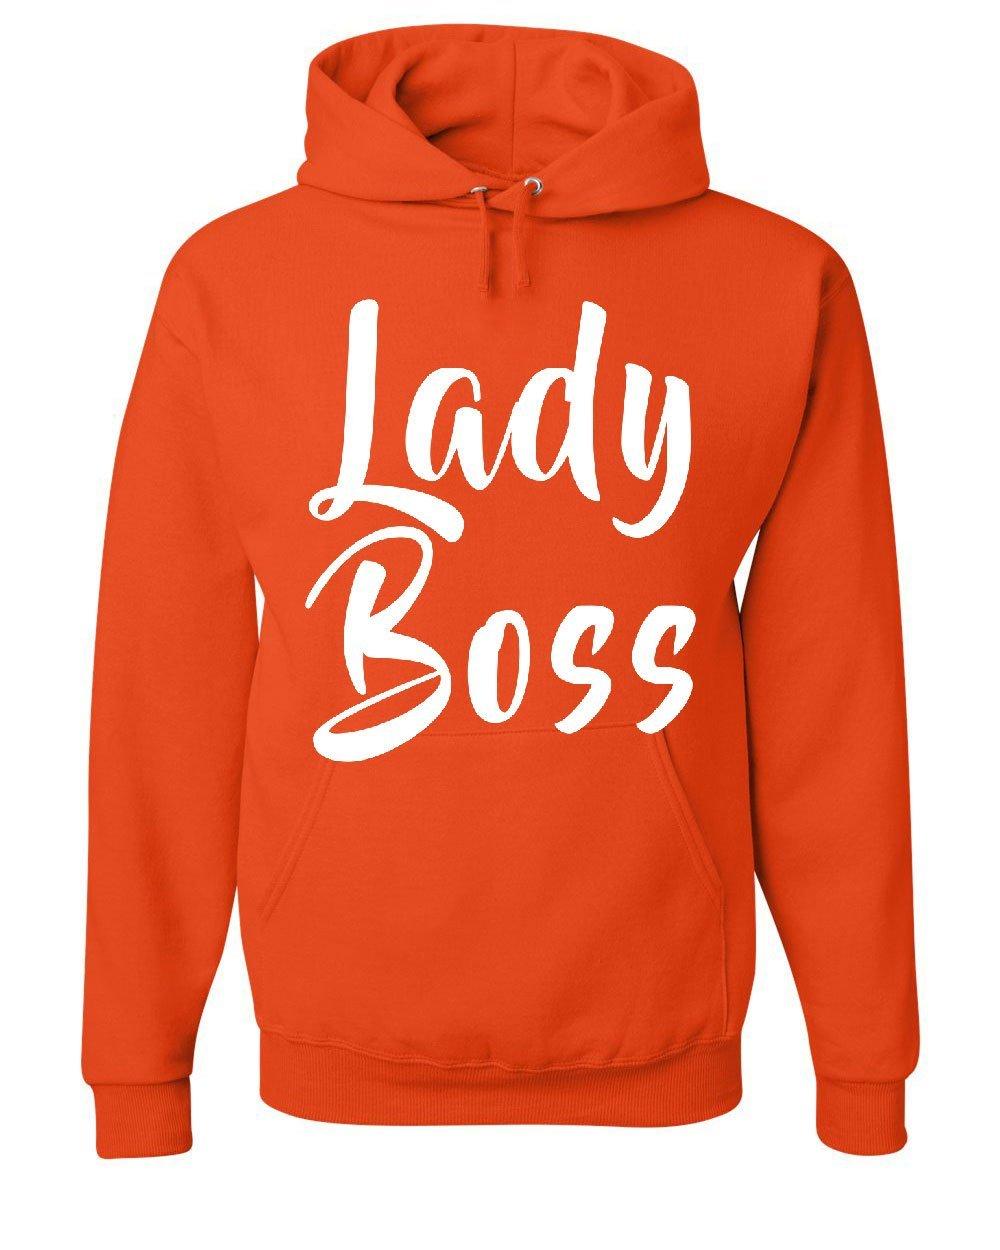 373b034e Amazon.com: Tee Hunt Lady Boss Hoodie Funny Women's Rights Glam Girl Power  Feminist Sweatshirt: Clothing